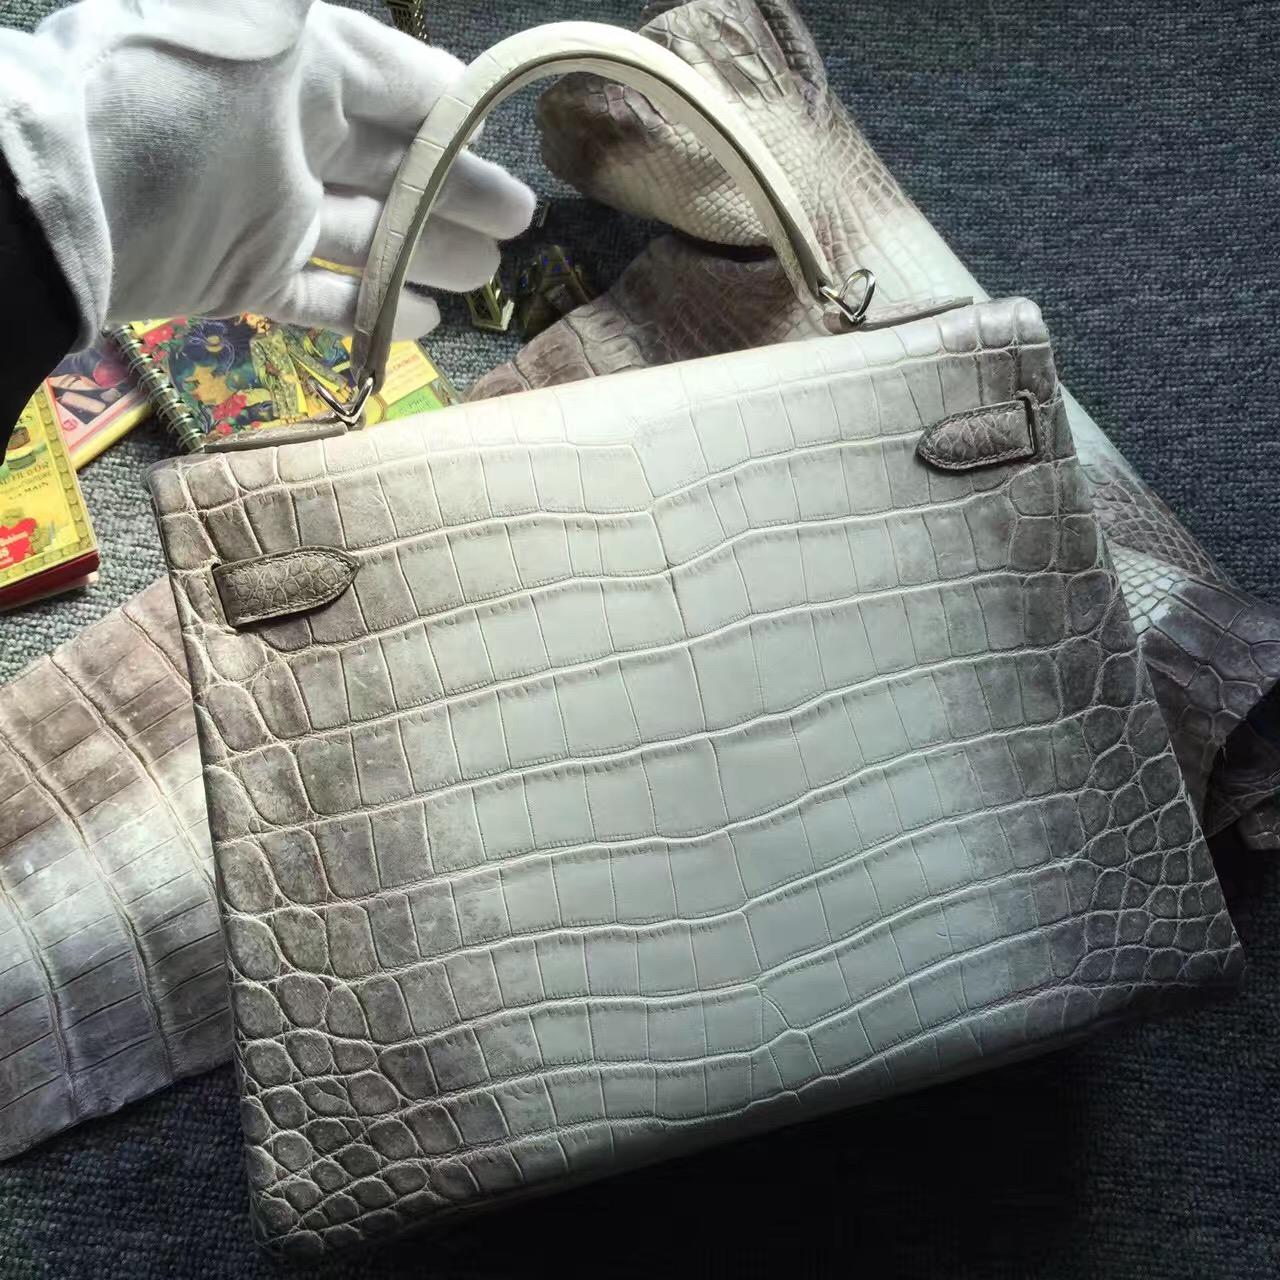 Noble Women's Bag Hermes Himalaya Crocodile  Leather Retourne Kelly Bag32CM